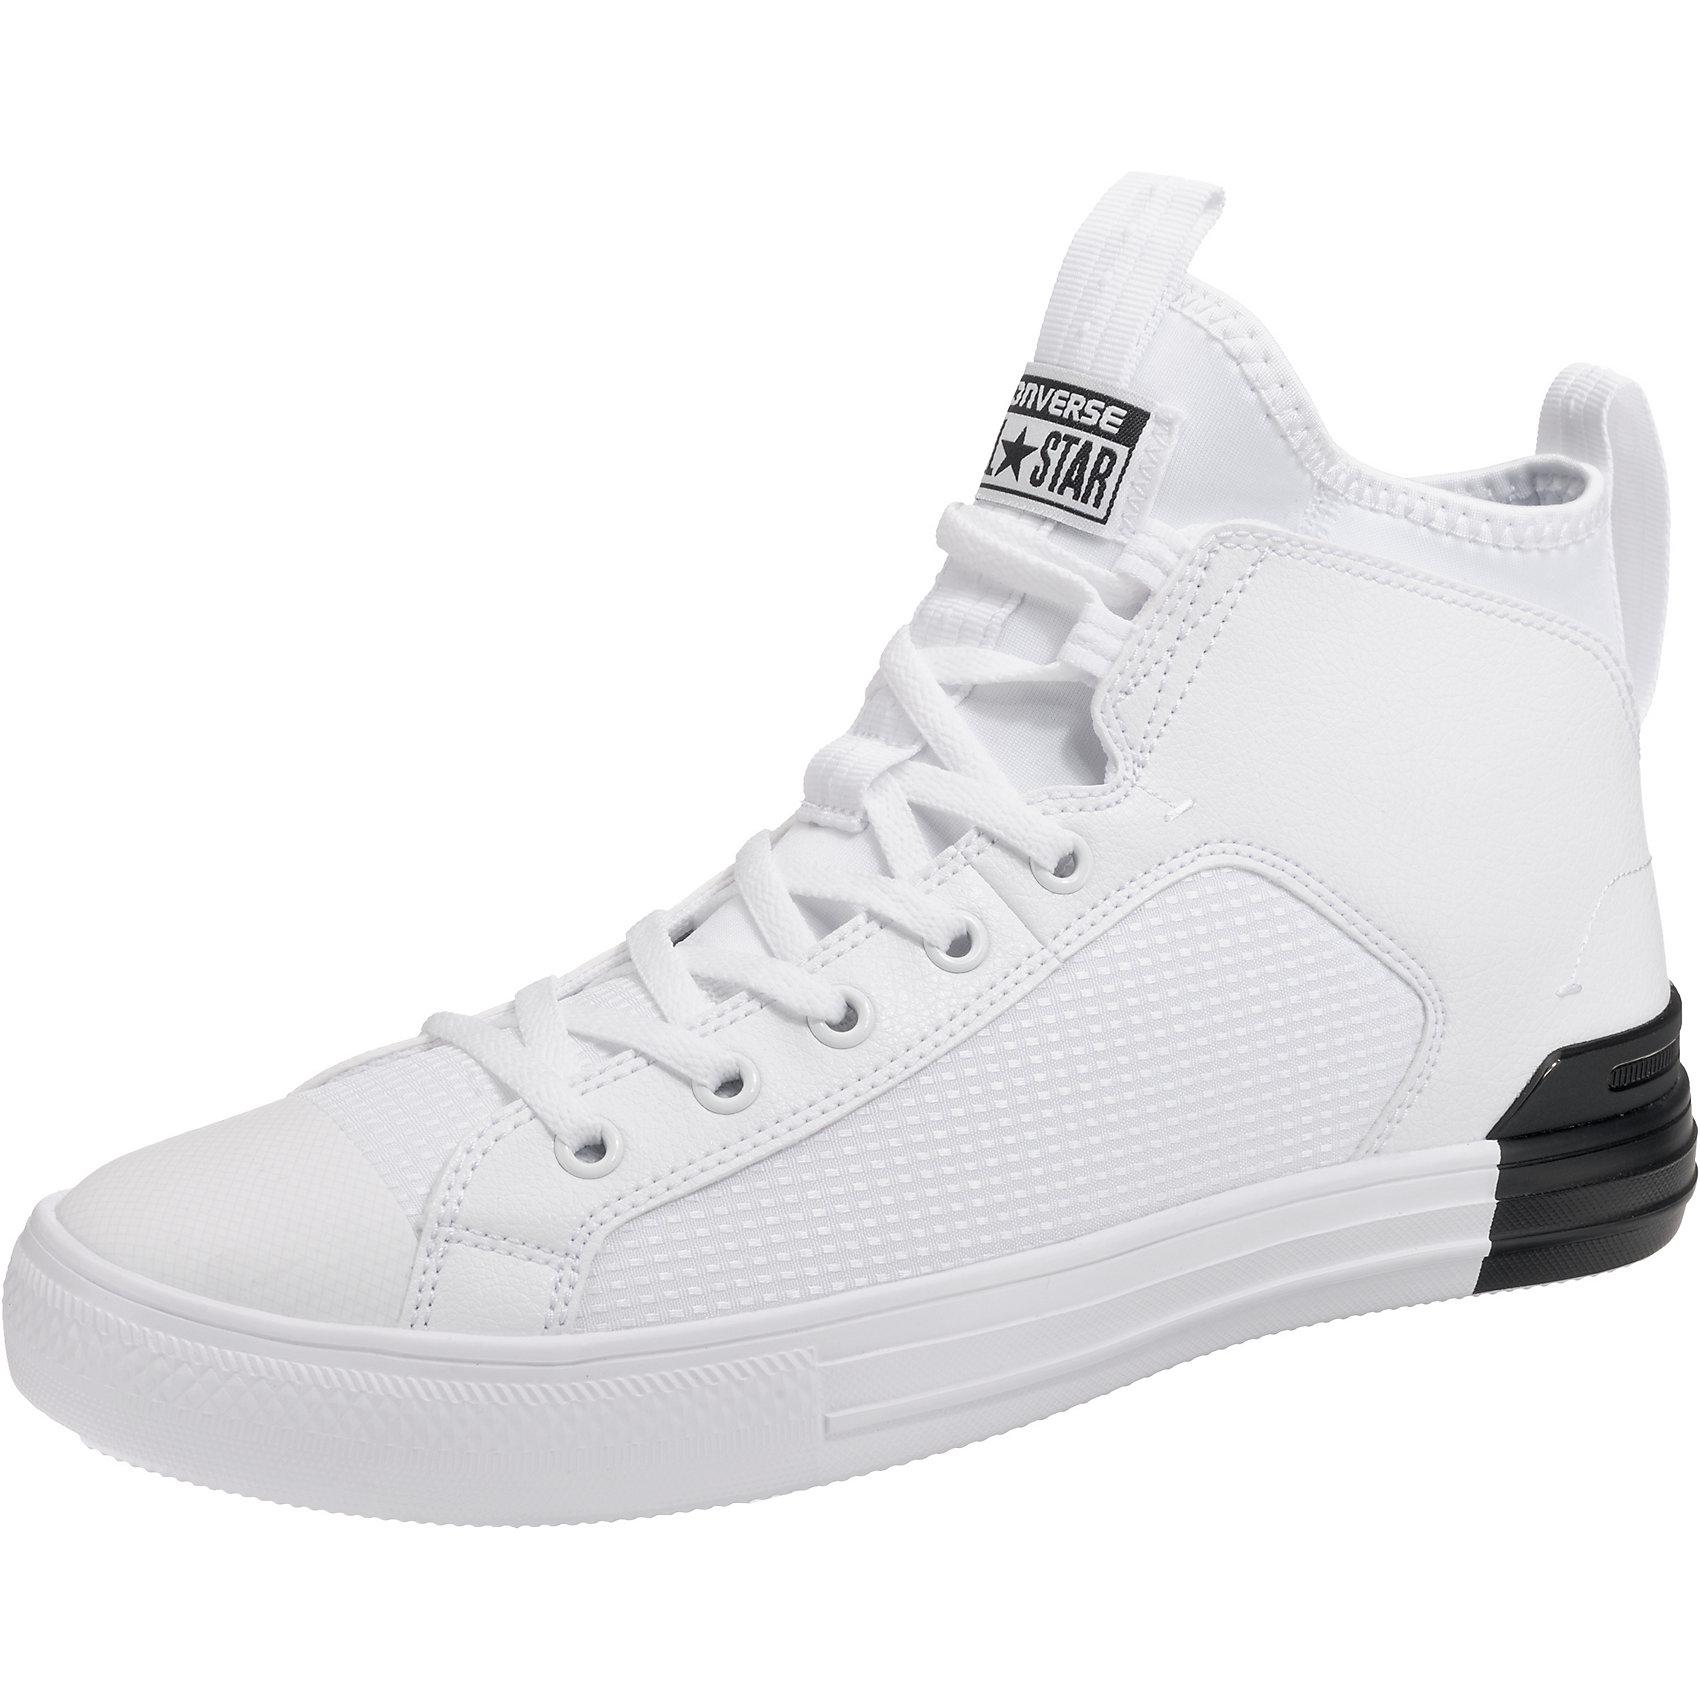 Neu CONVERSE Chuck Taylor All Star Ultra Mid Sneakers 7024457 für ... 25851848d62